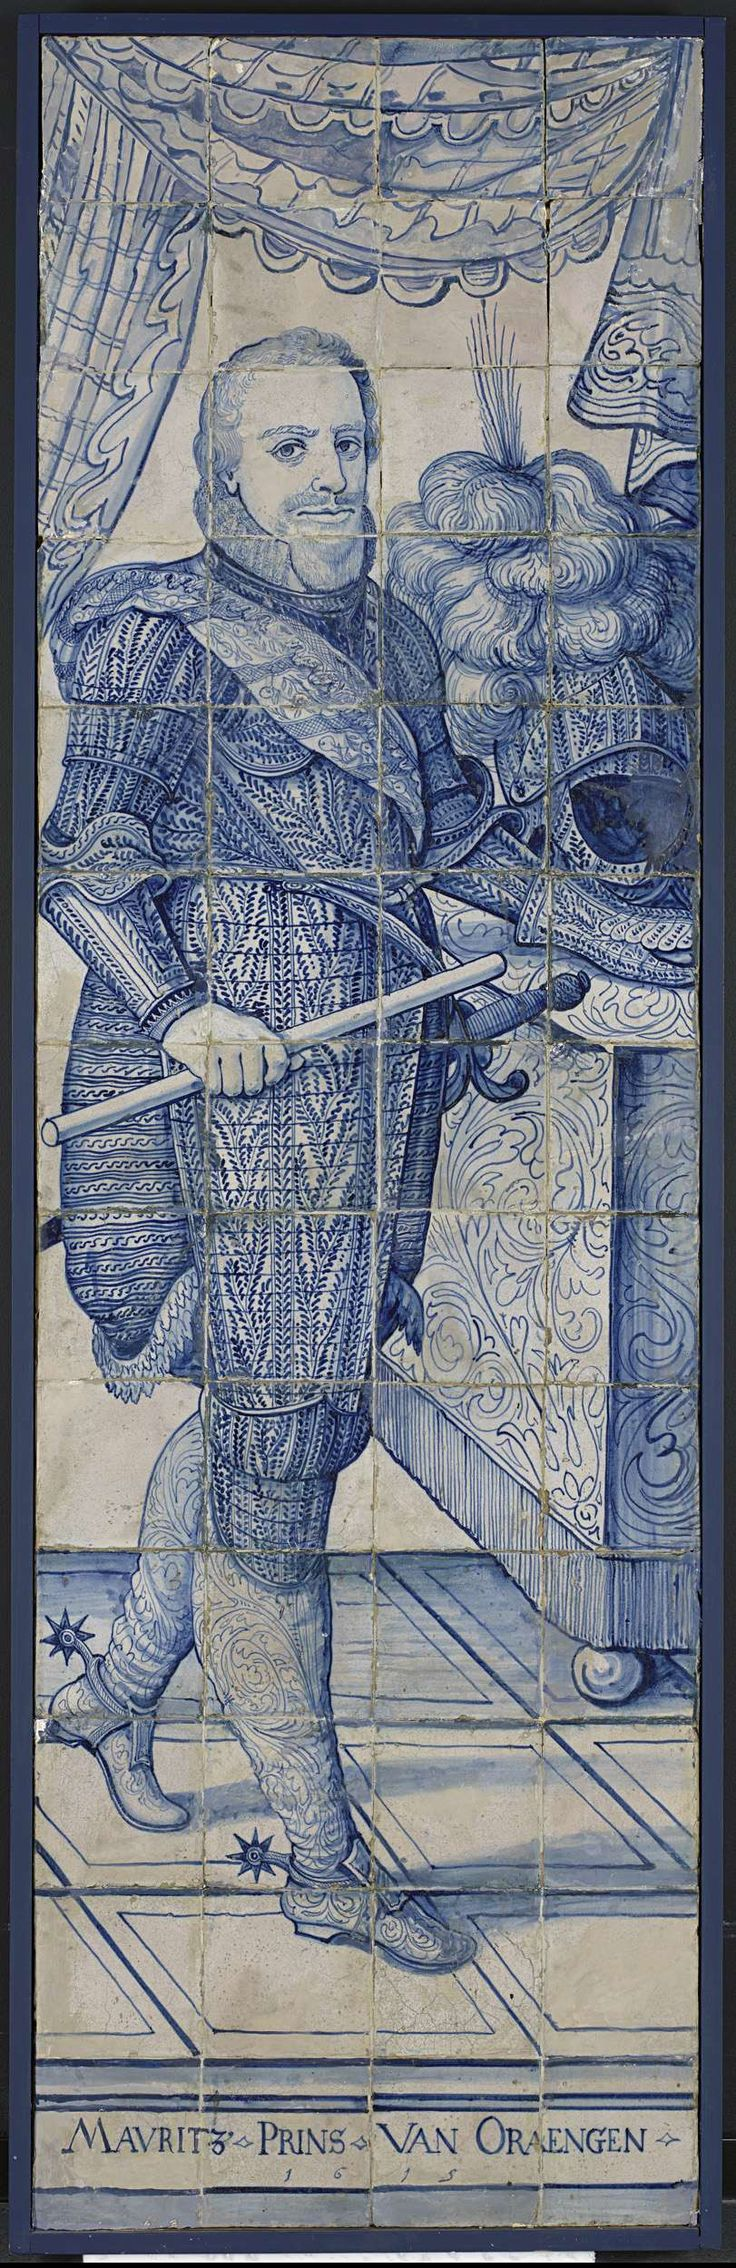 Tegeltableau met portret van Prins Maurits, anoniem, 1615